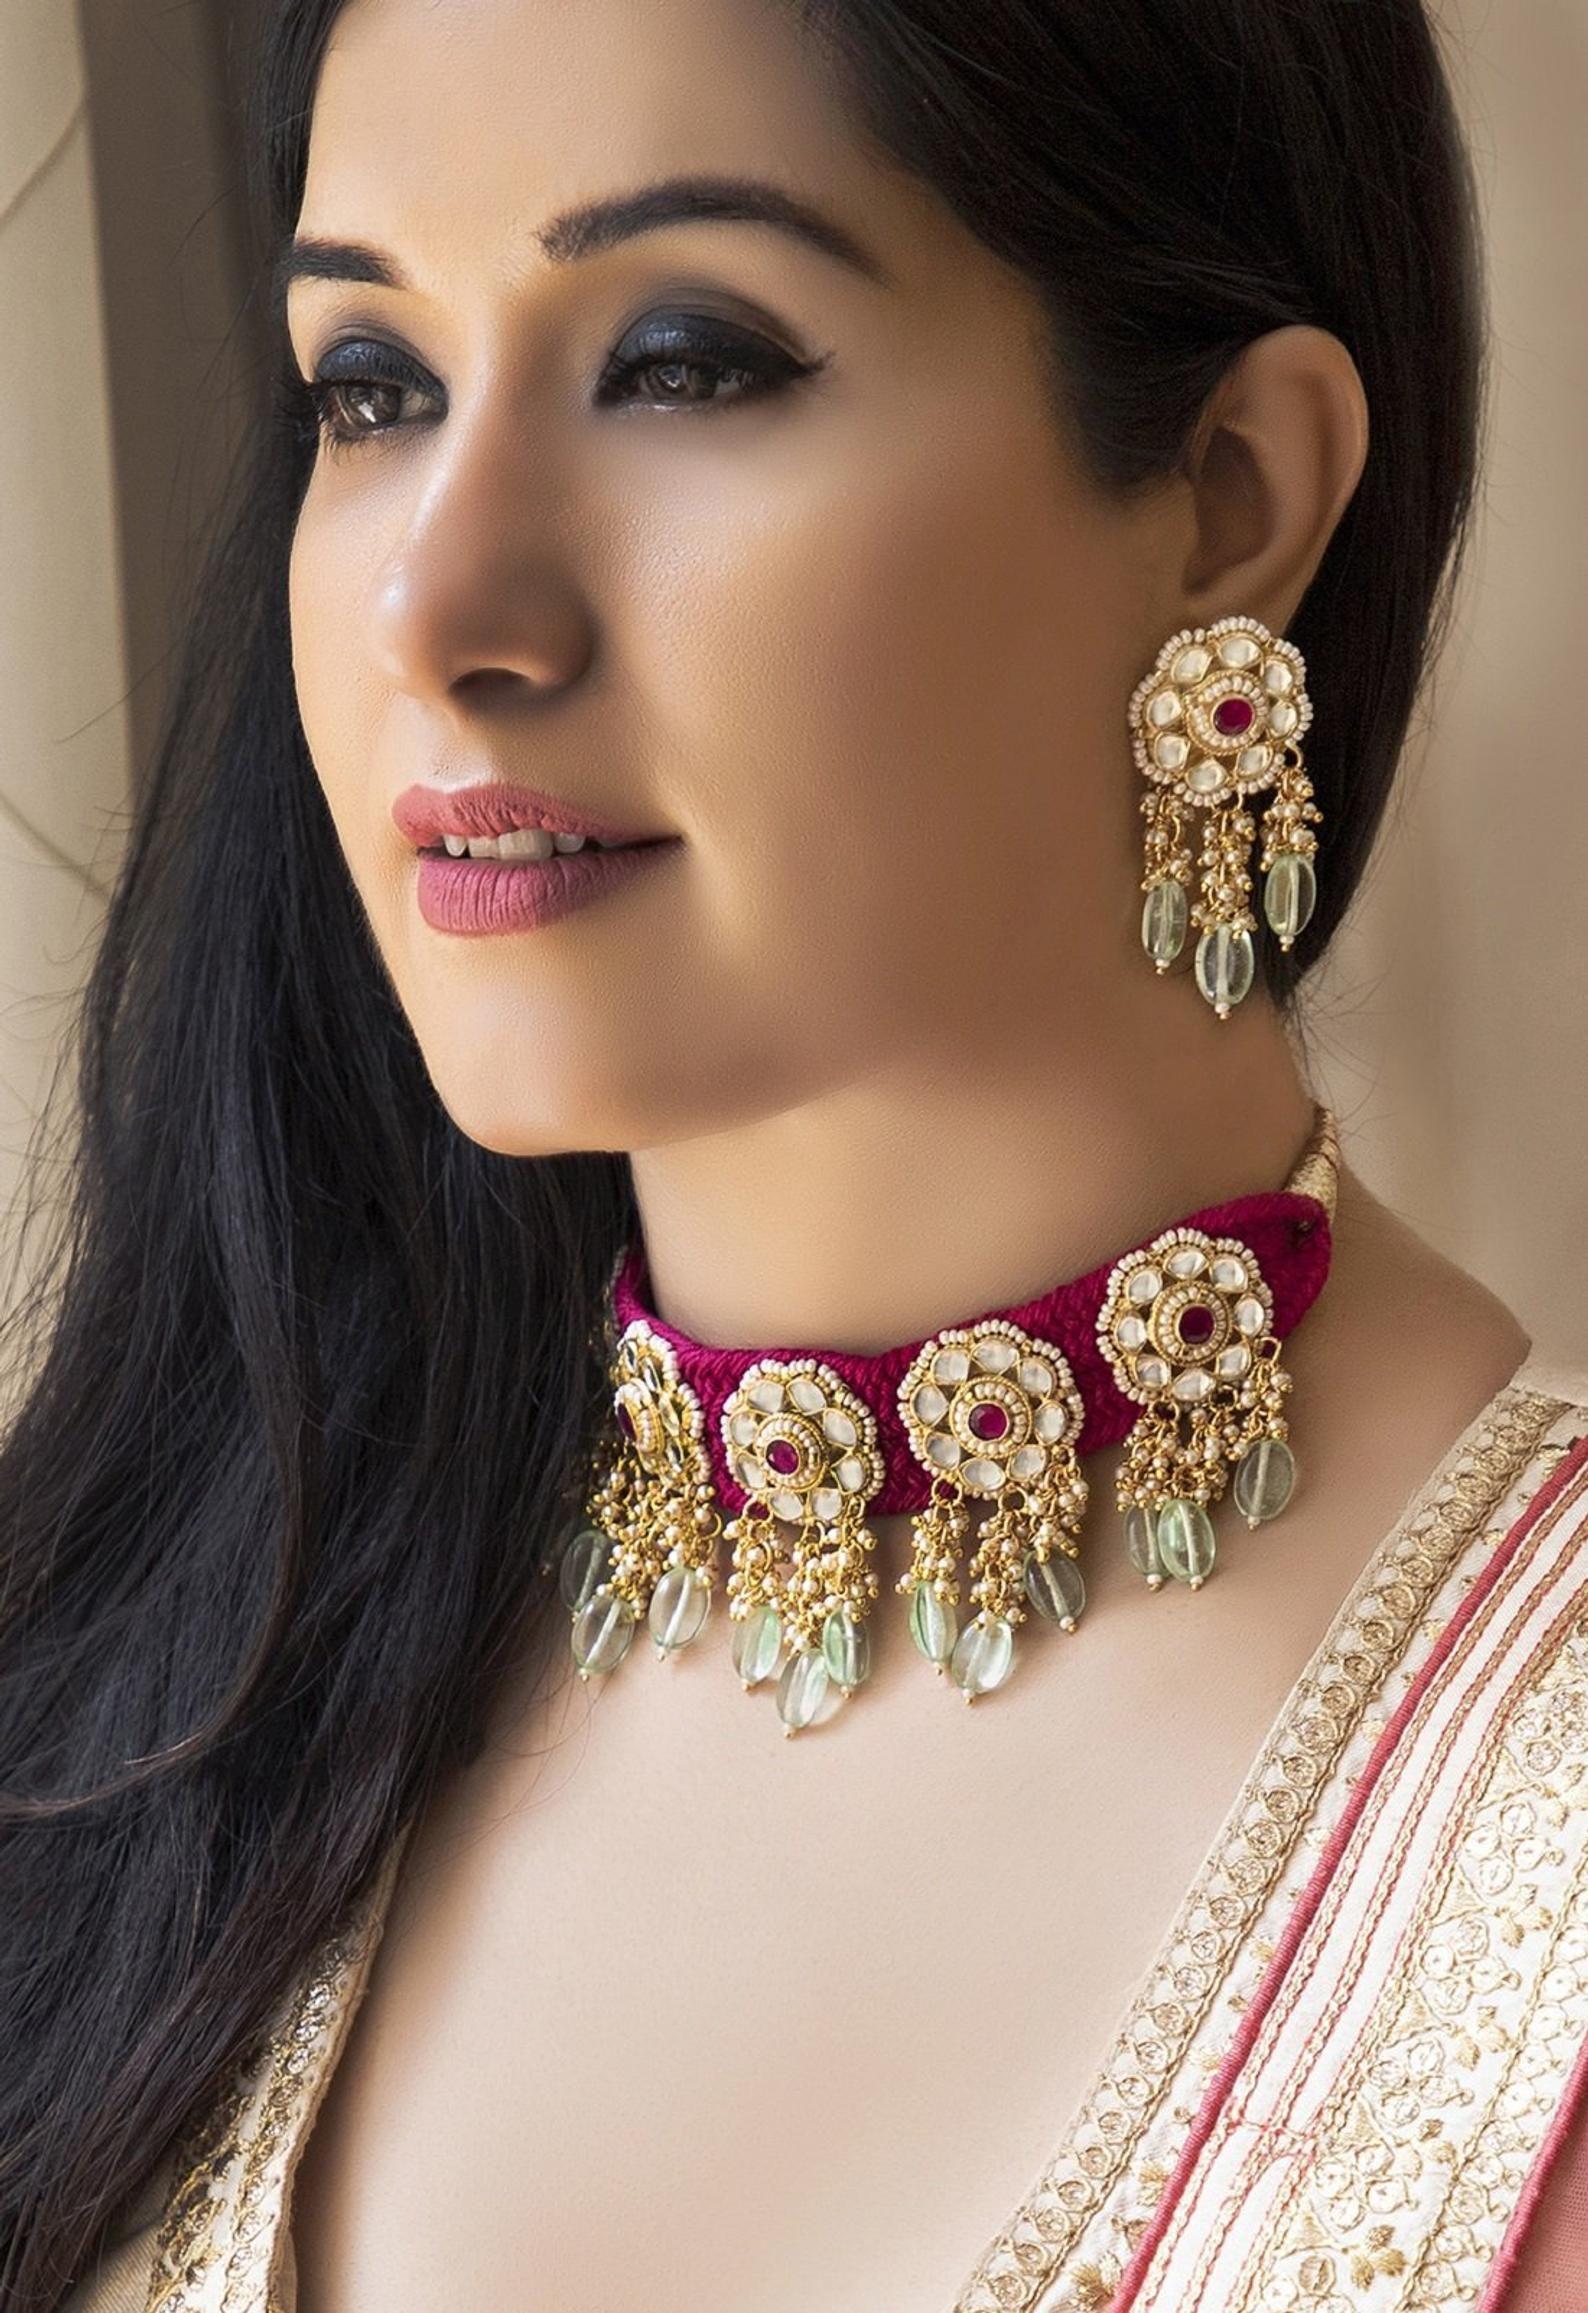 Kundan Jewelry Choker Necklace Sabyasachi Inspired